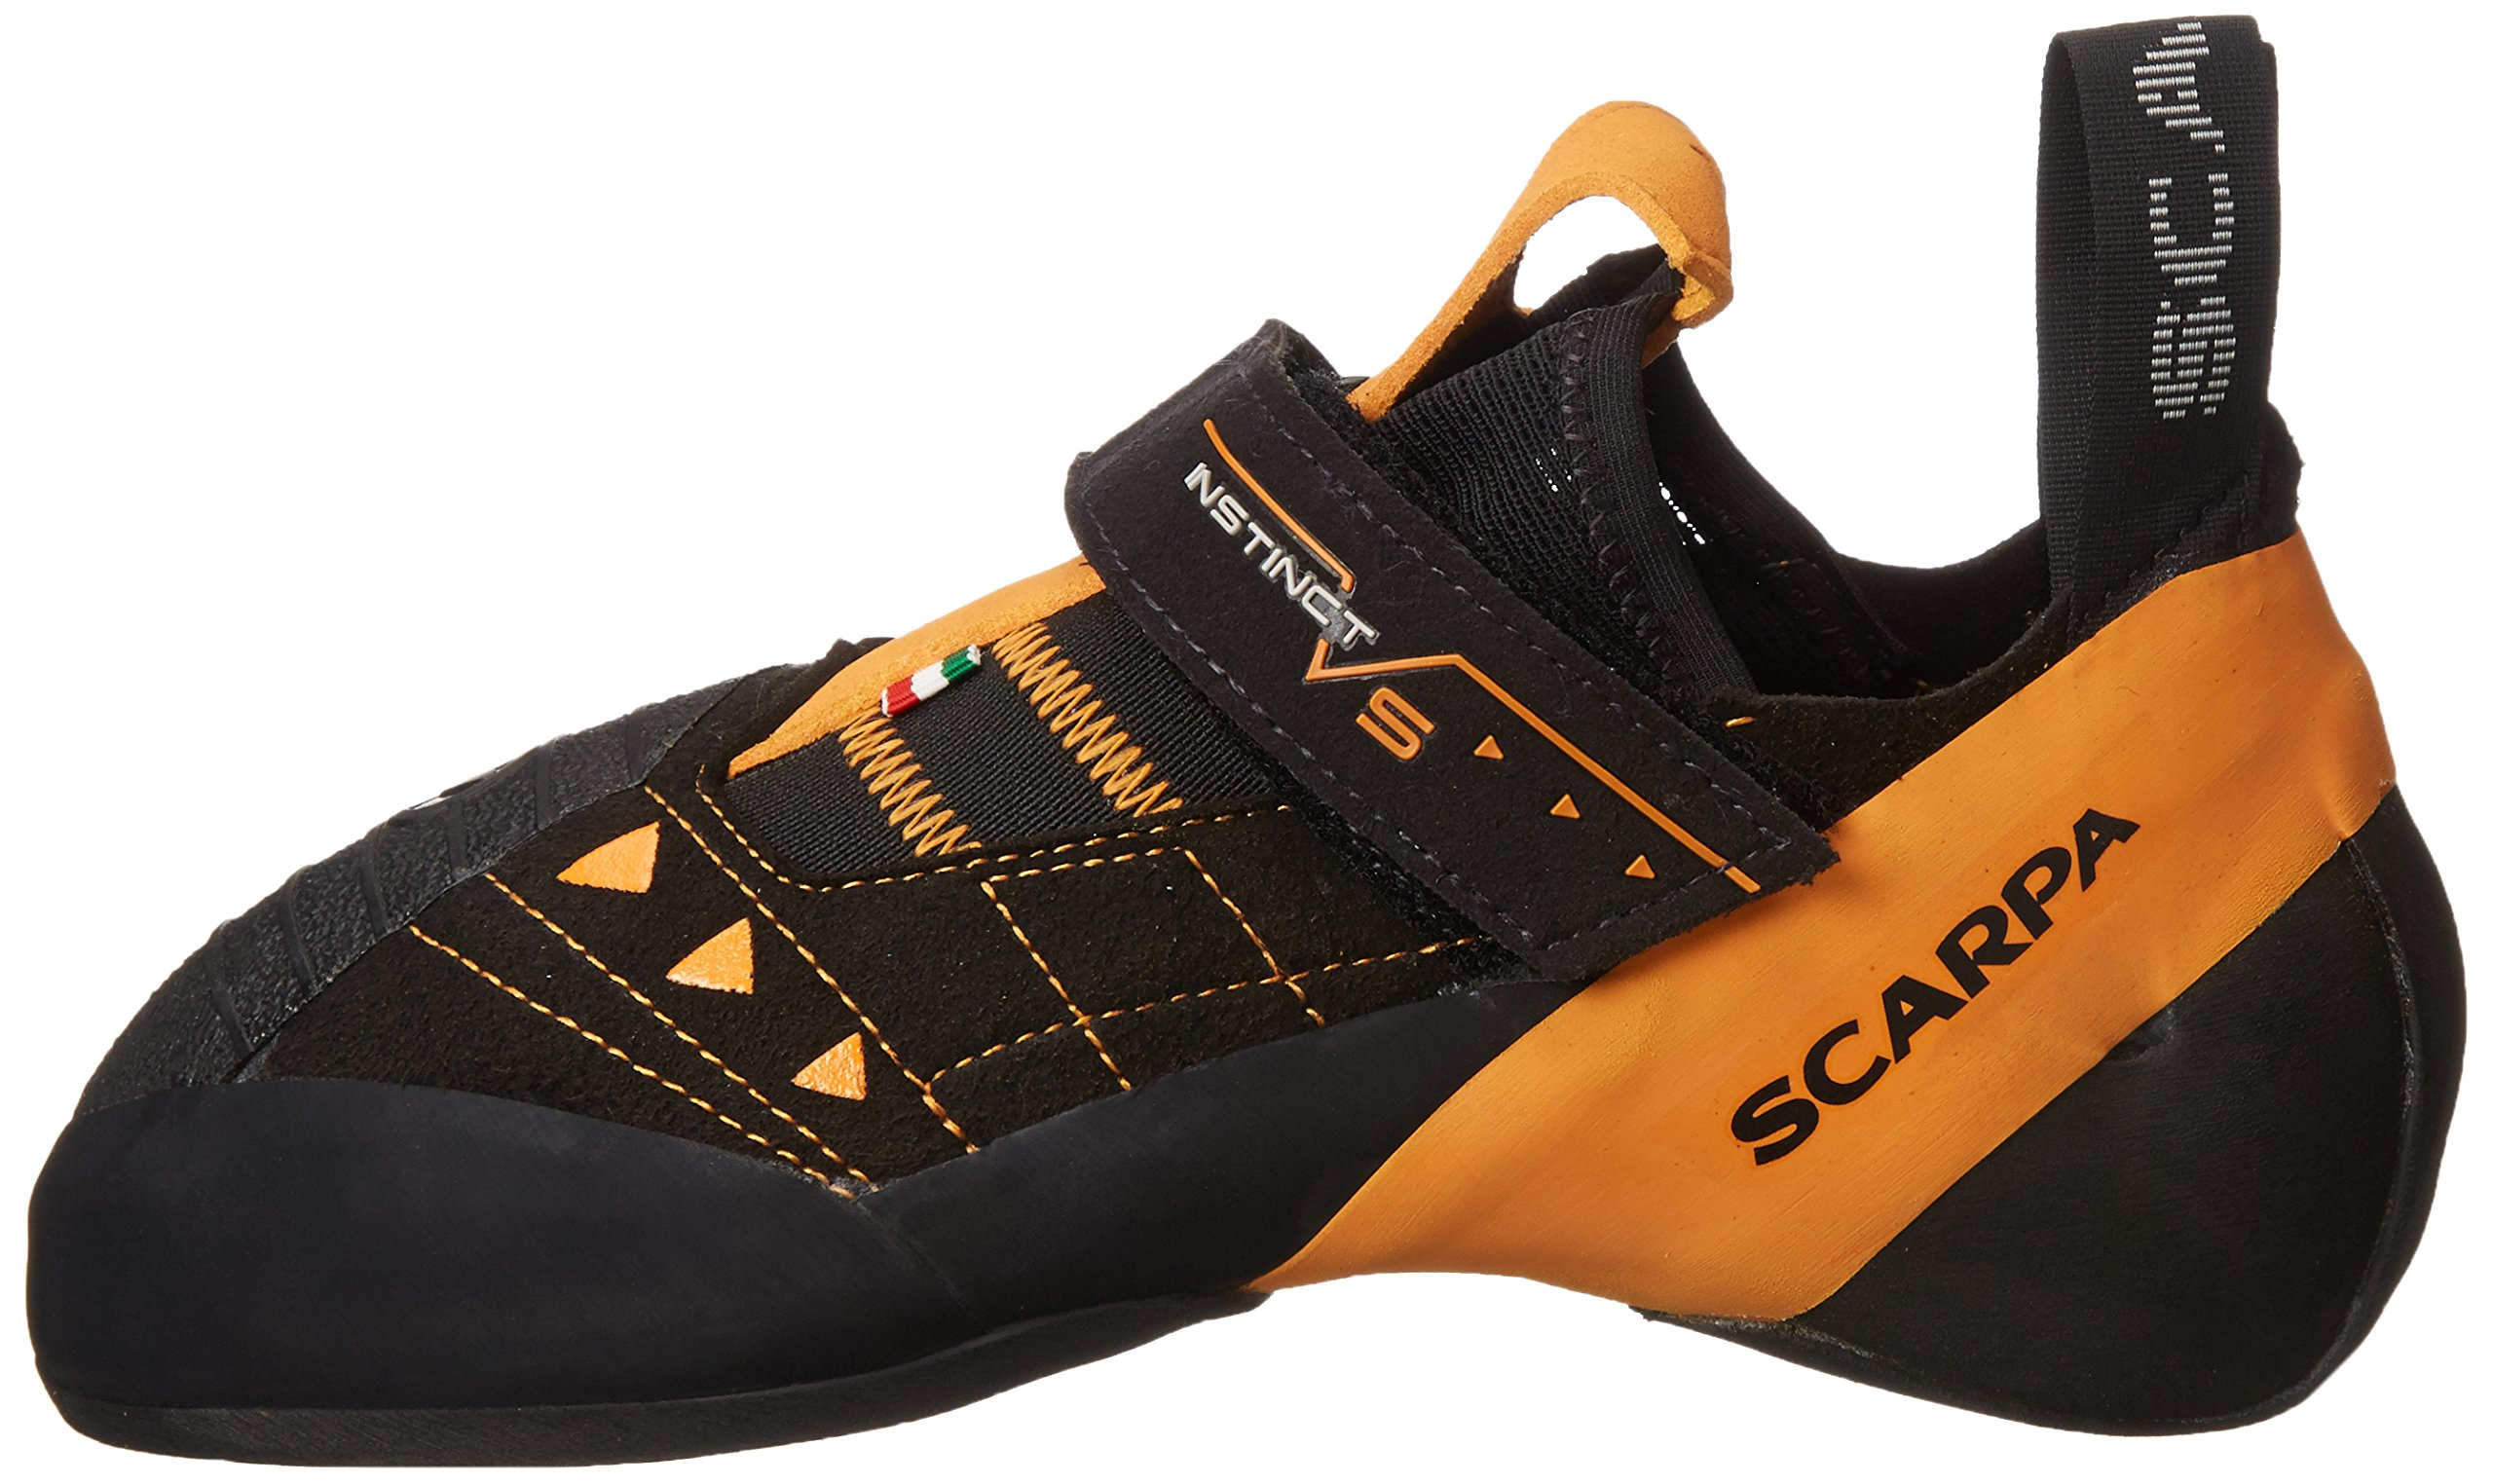 Scarpa Men's Instinct VS Climbing Shoe by SCARPA (Image #5)